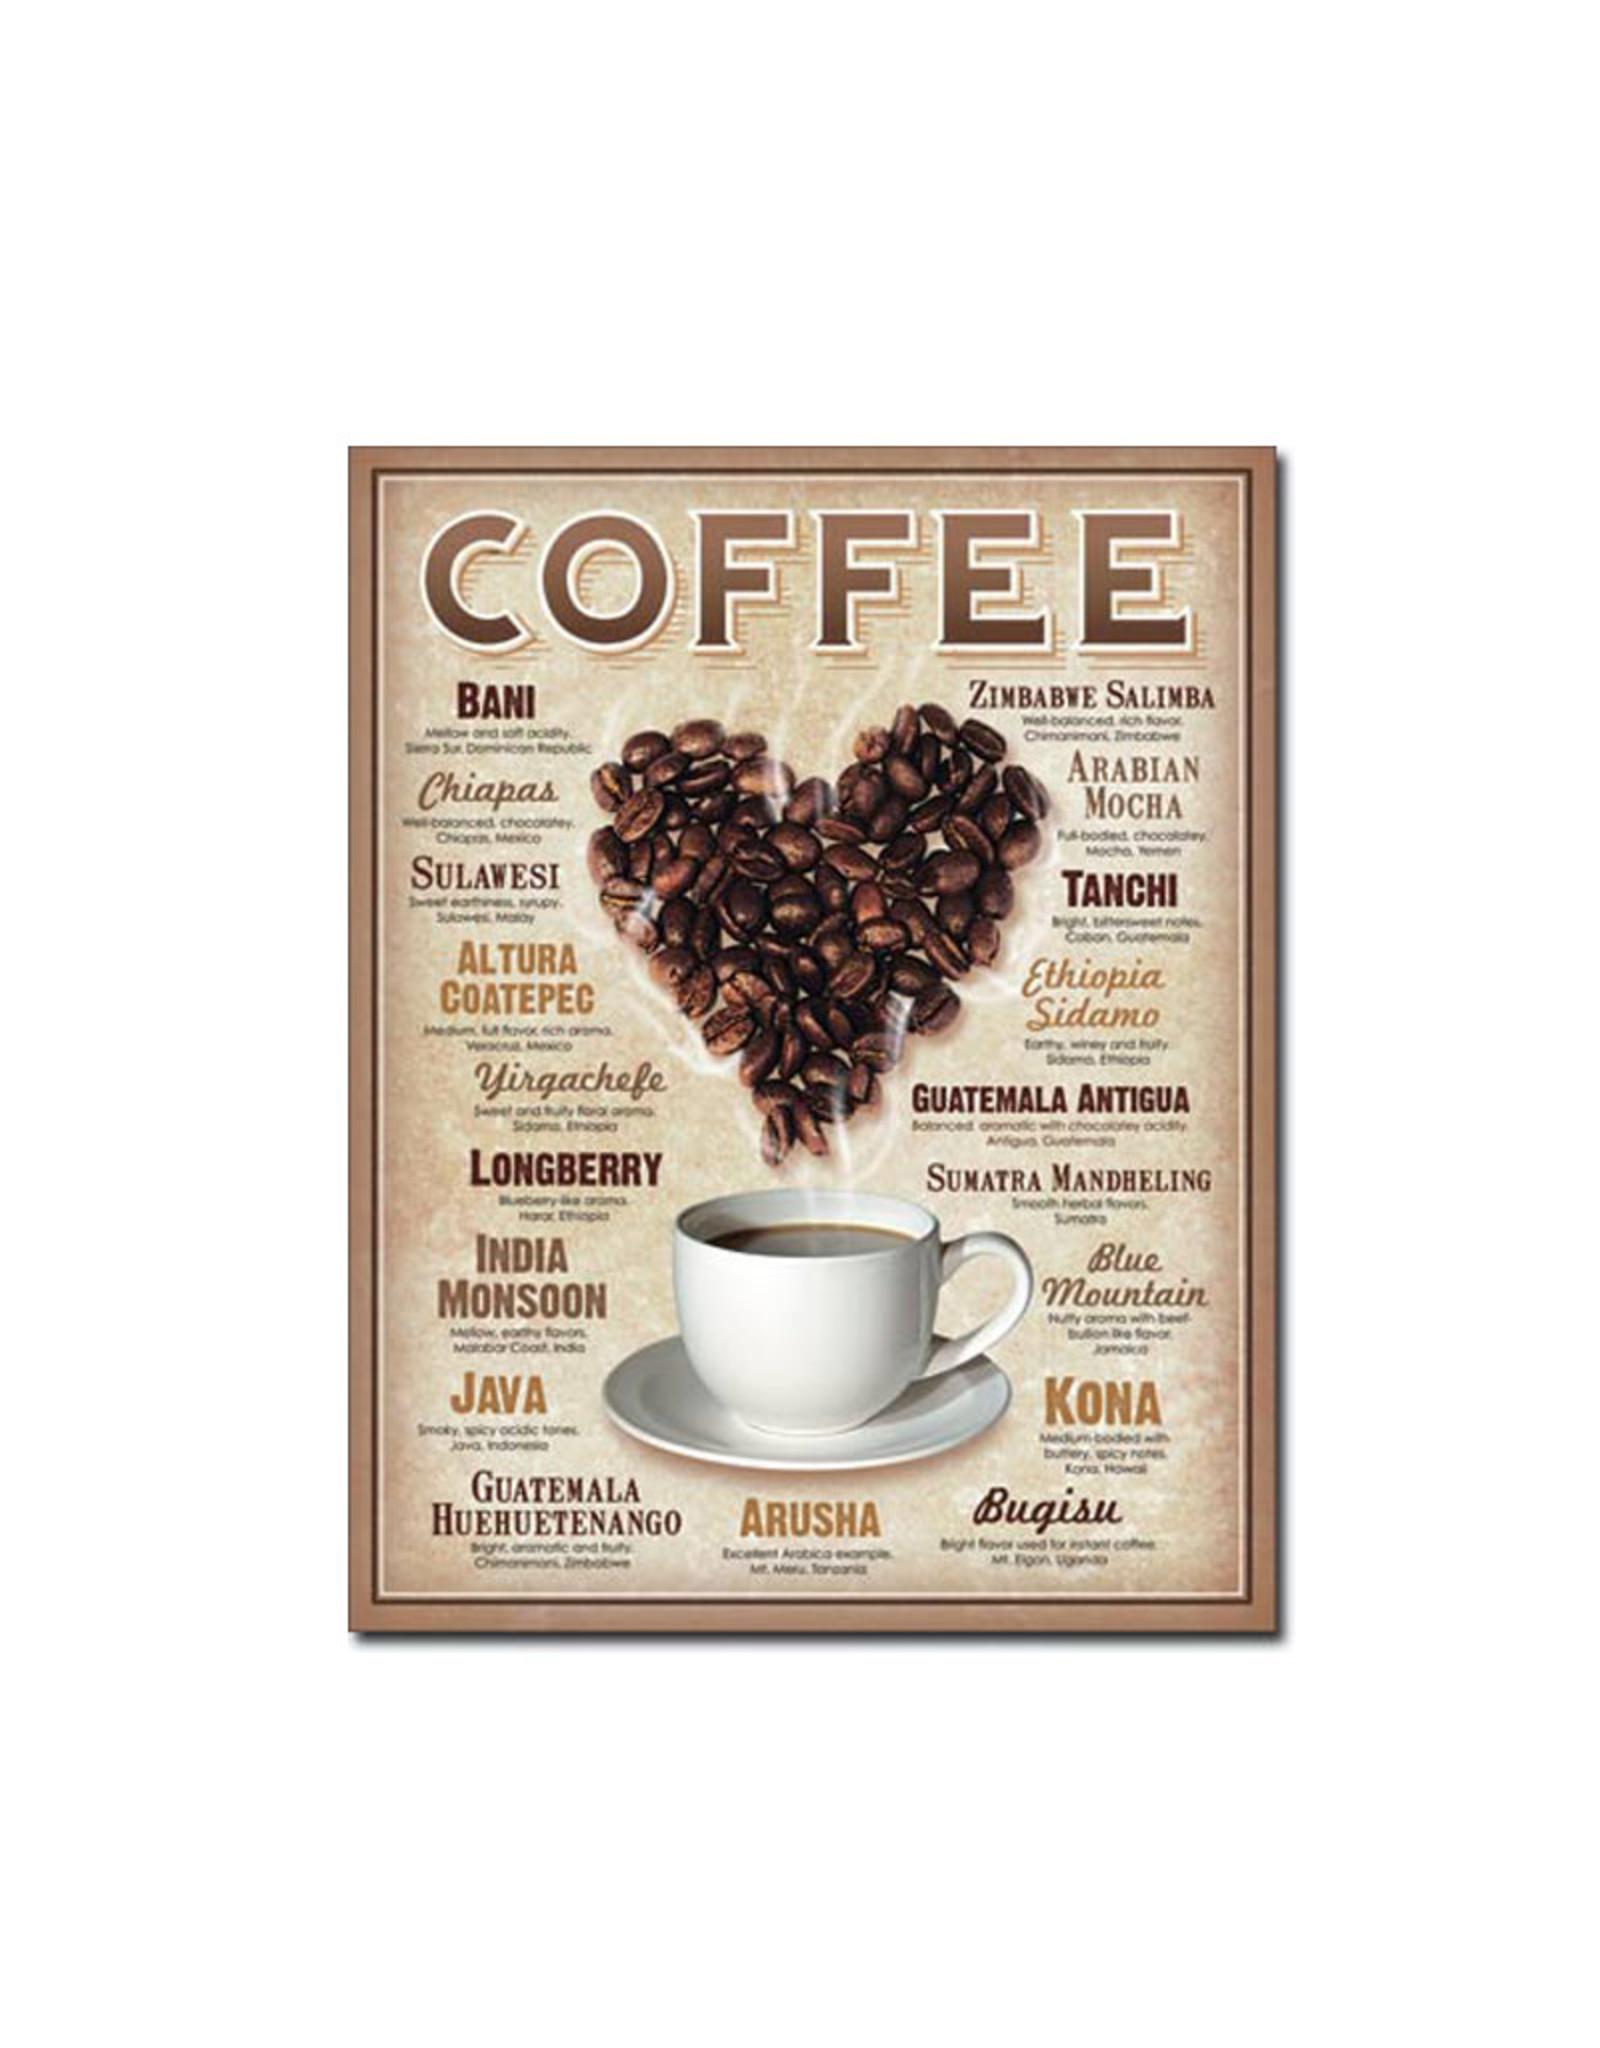 Coffee ( Metal Sign 12.5 X 16 )